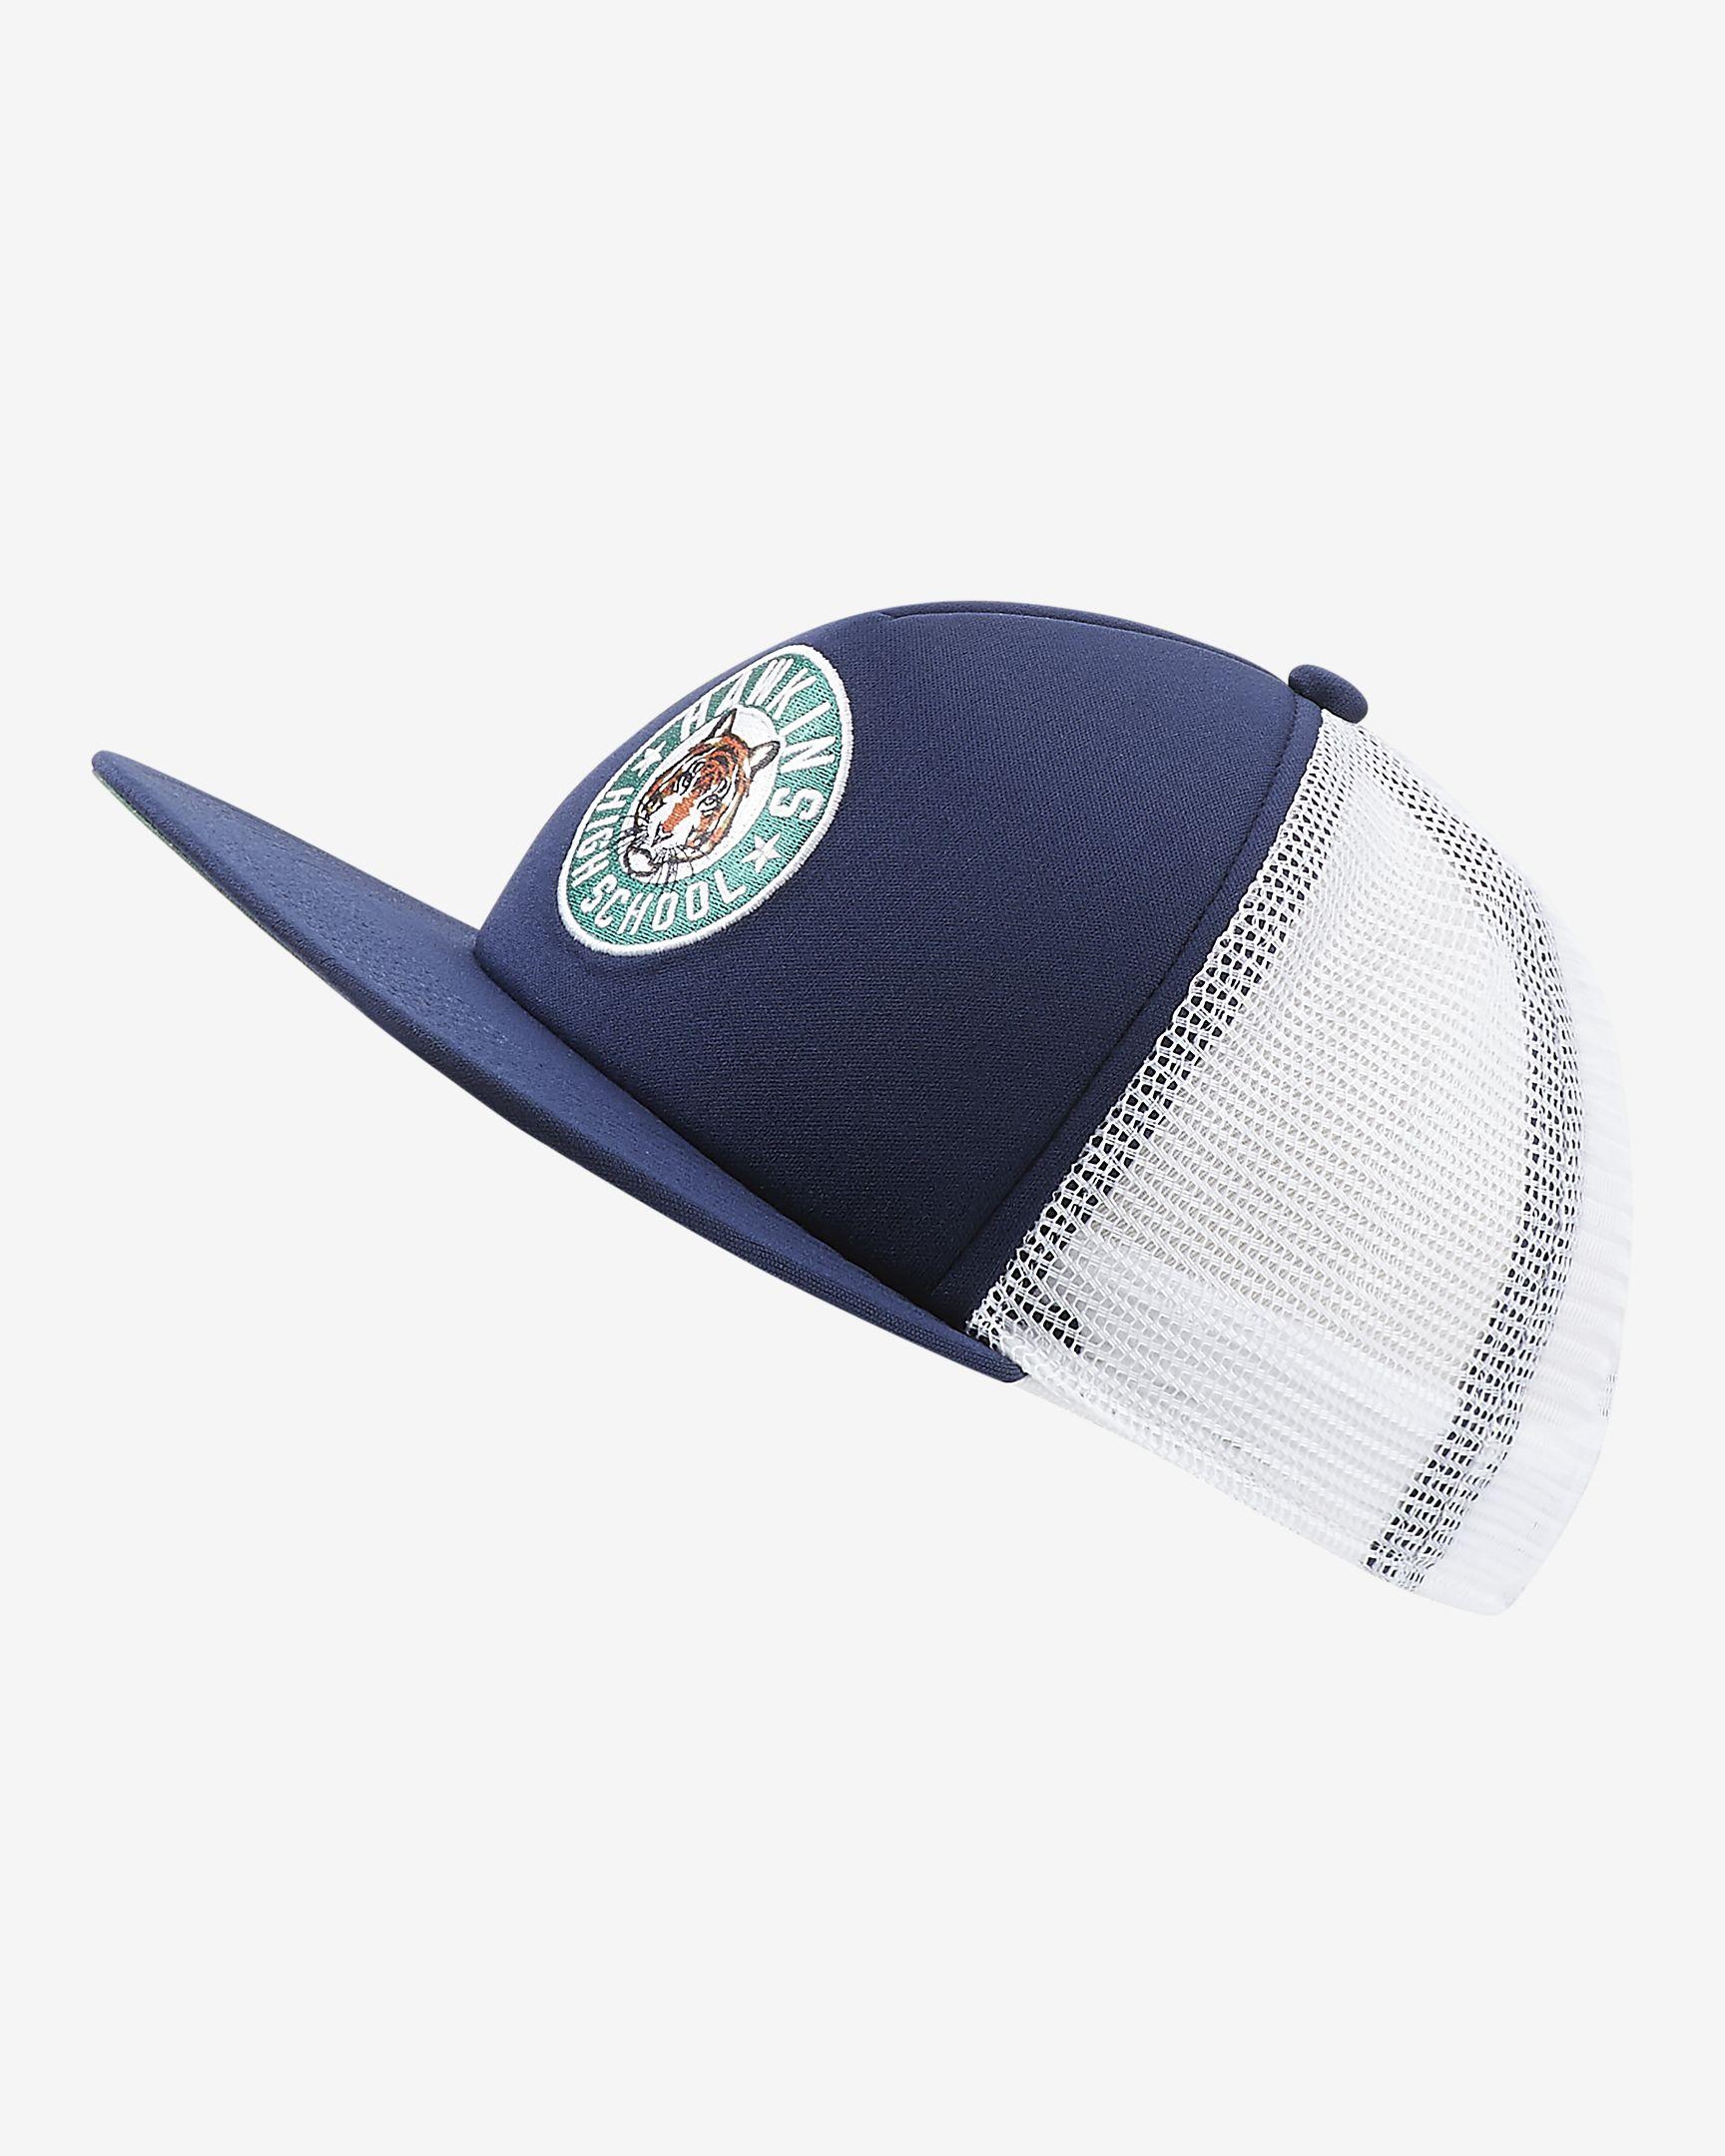 Nike x Stranger Things Pro Snapback Cap